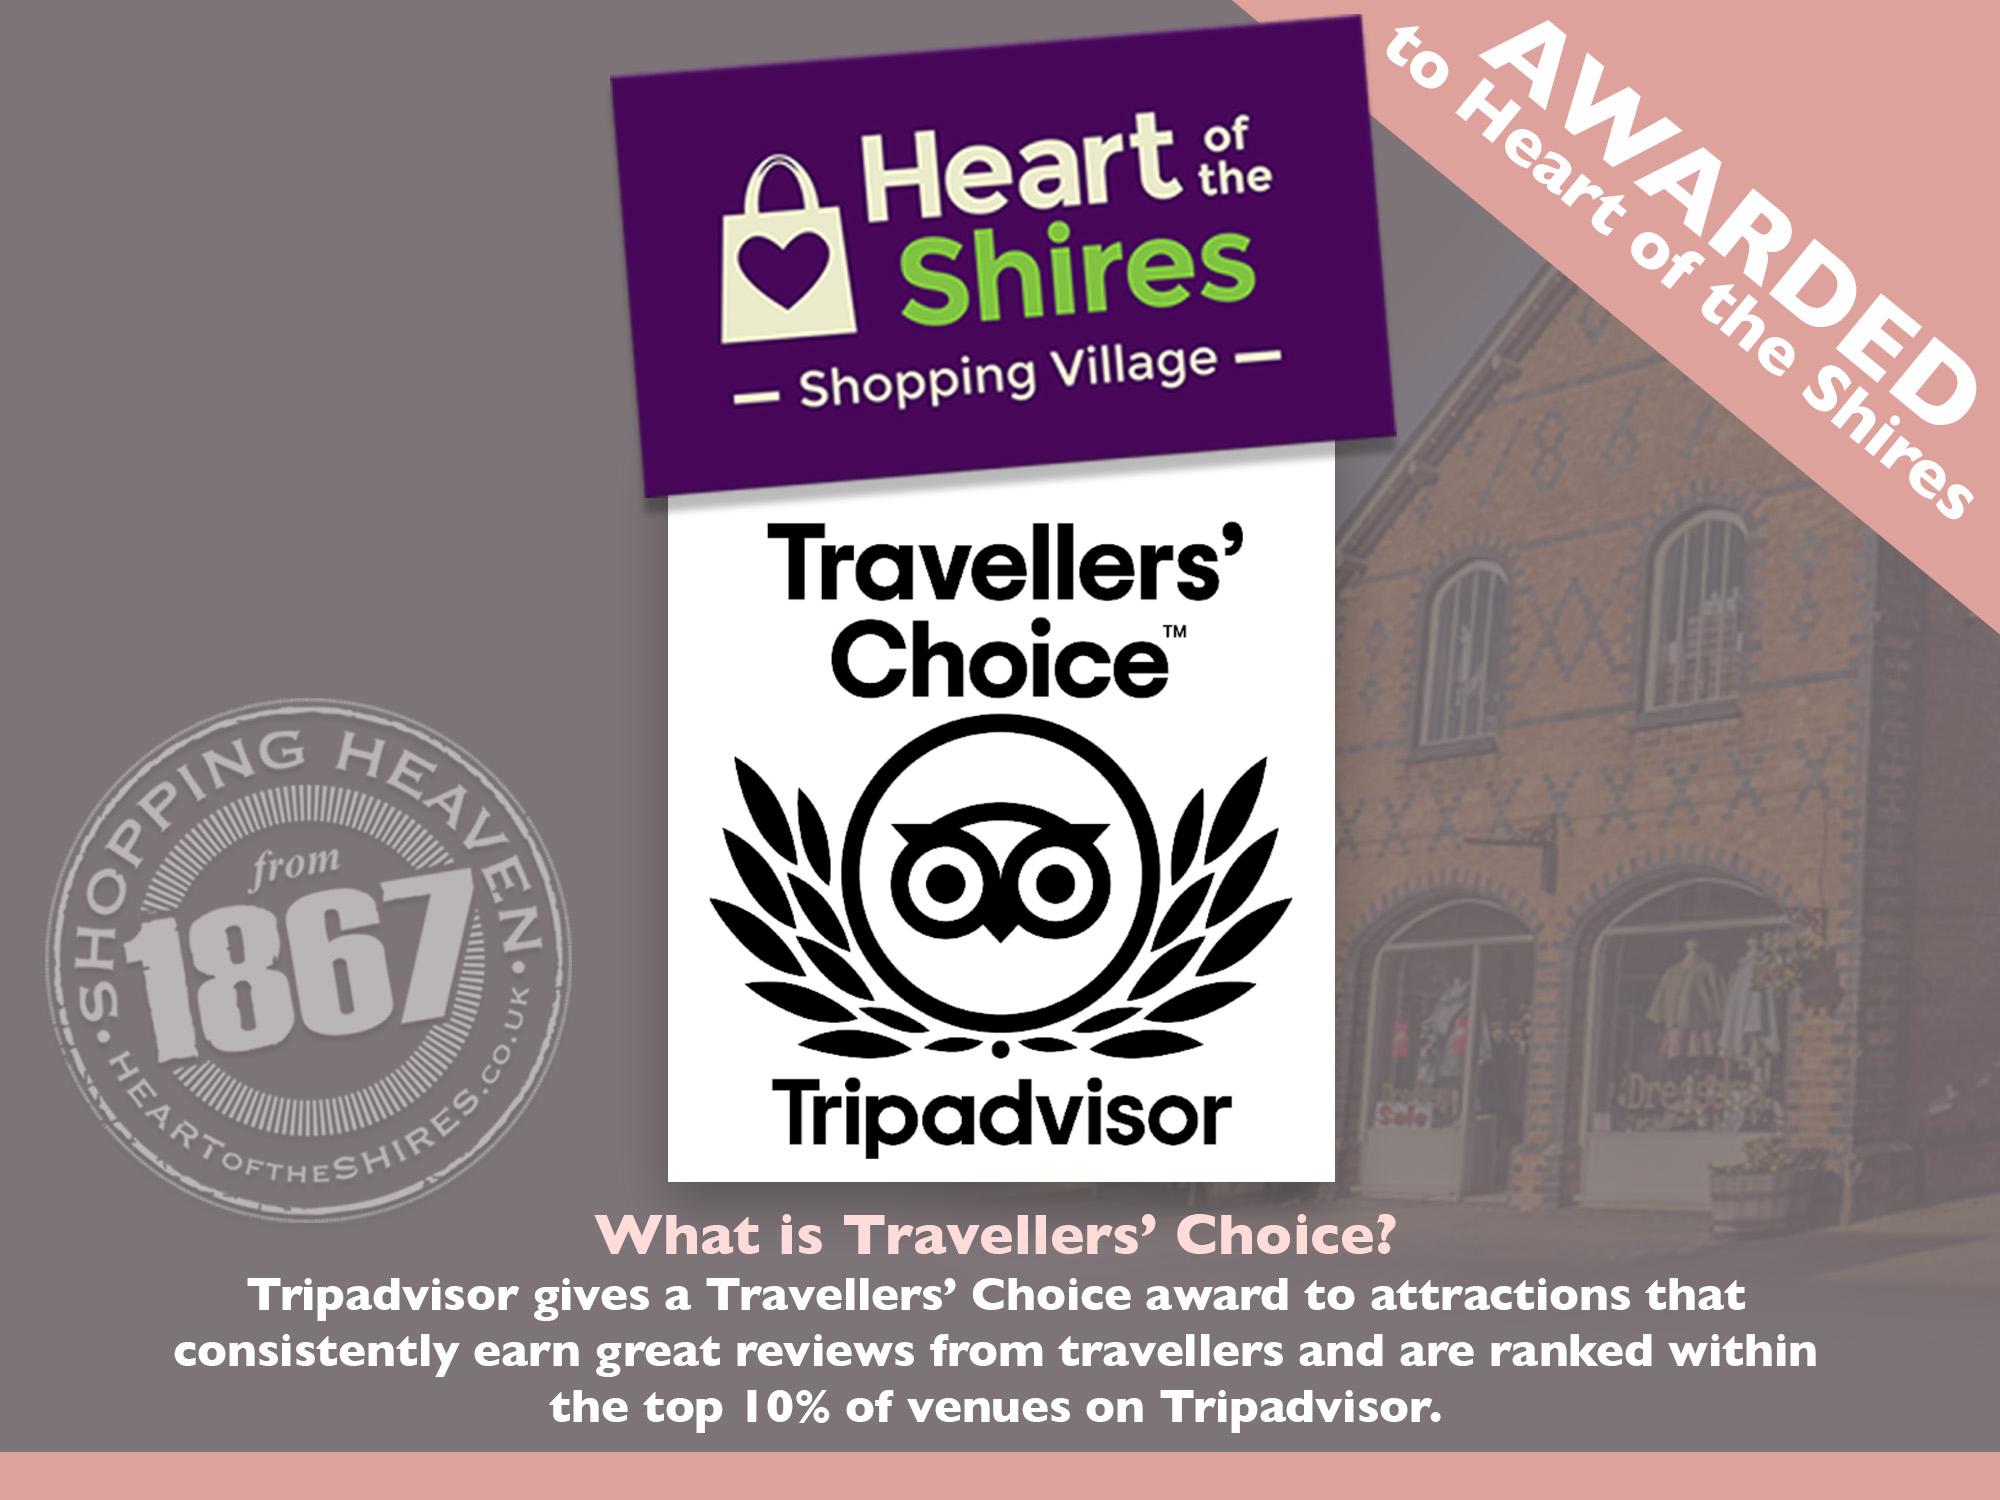 Tripadvisor Travellers' Choice award